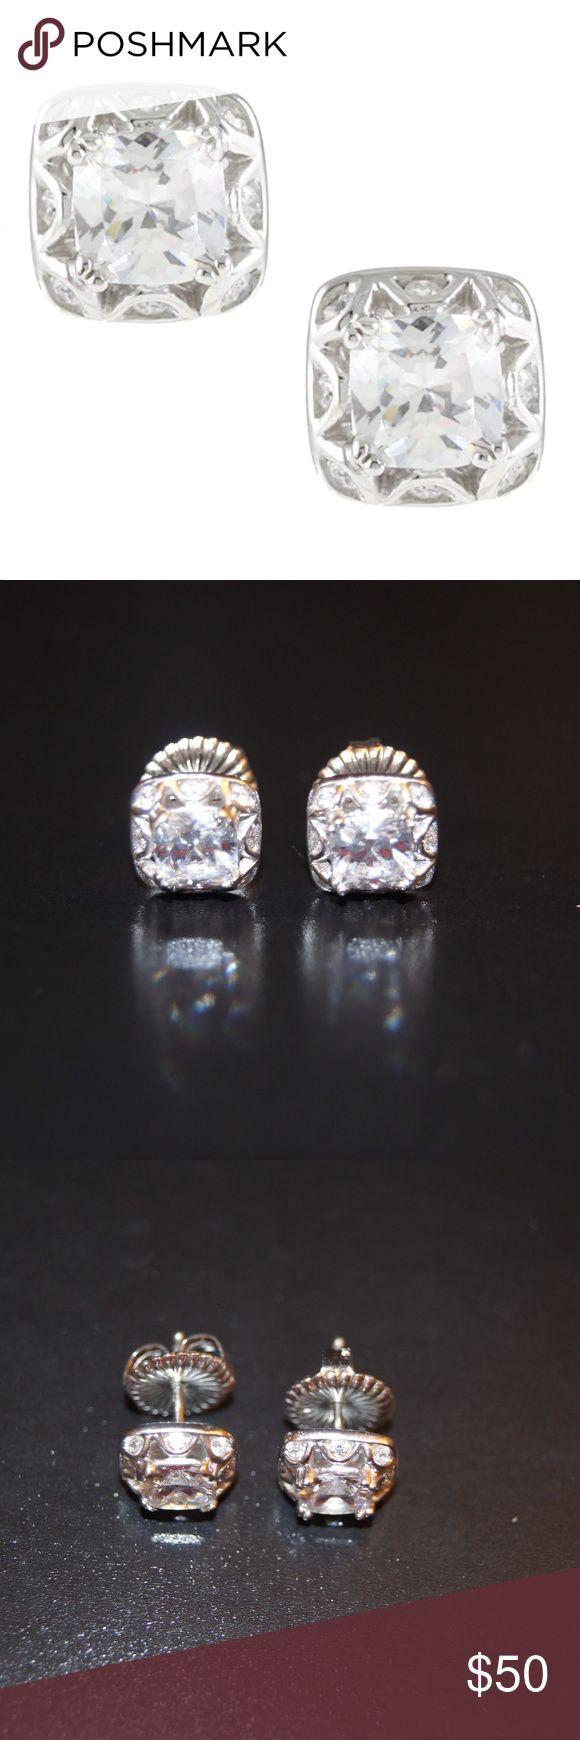 NWOT Tacori Sterling Silver CV Earrings & Necklace NWOT Tacori Sterling Silver CV Earrings & matching Necklace.  Never been worn before. Tacori Jewelry Earrings